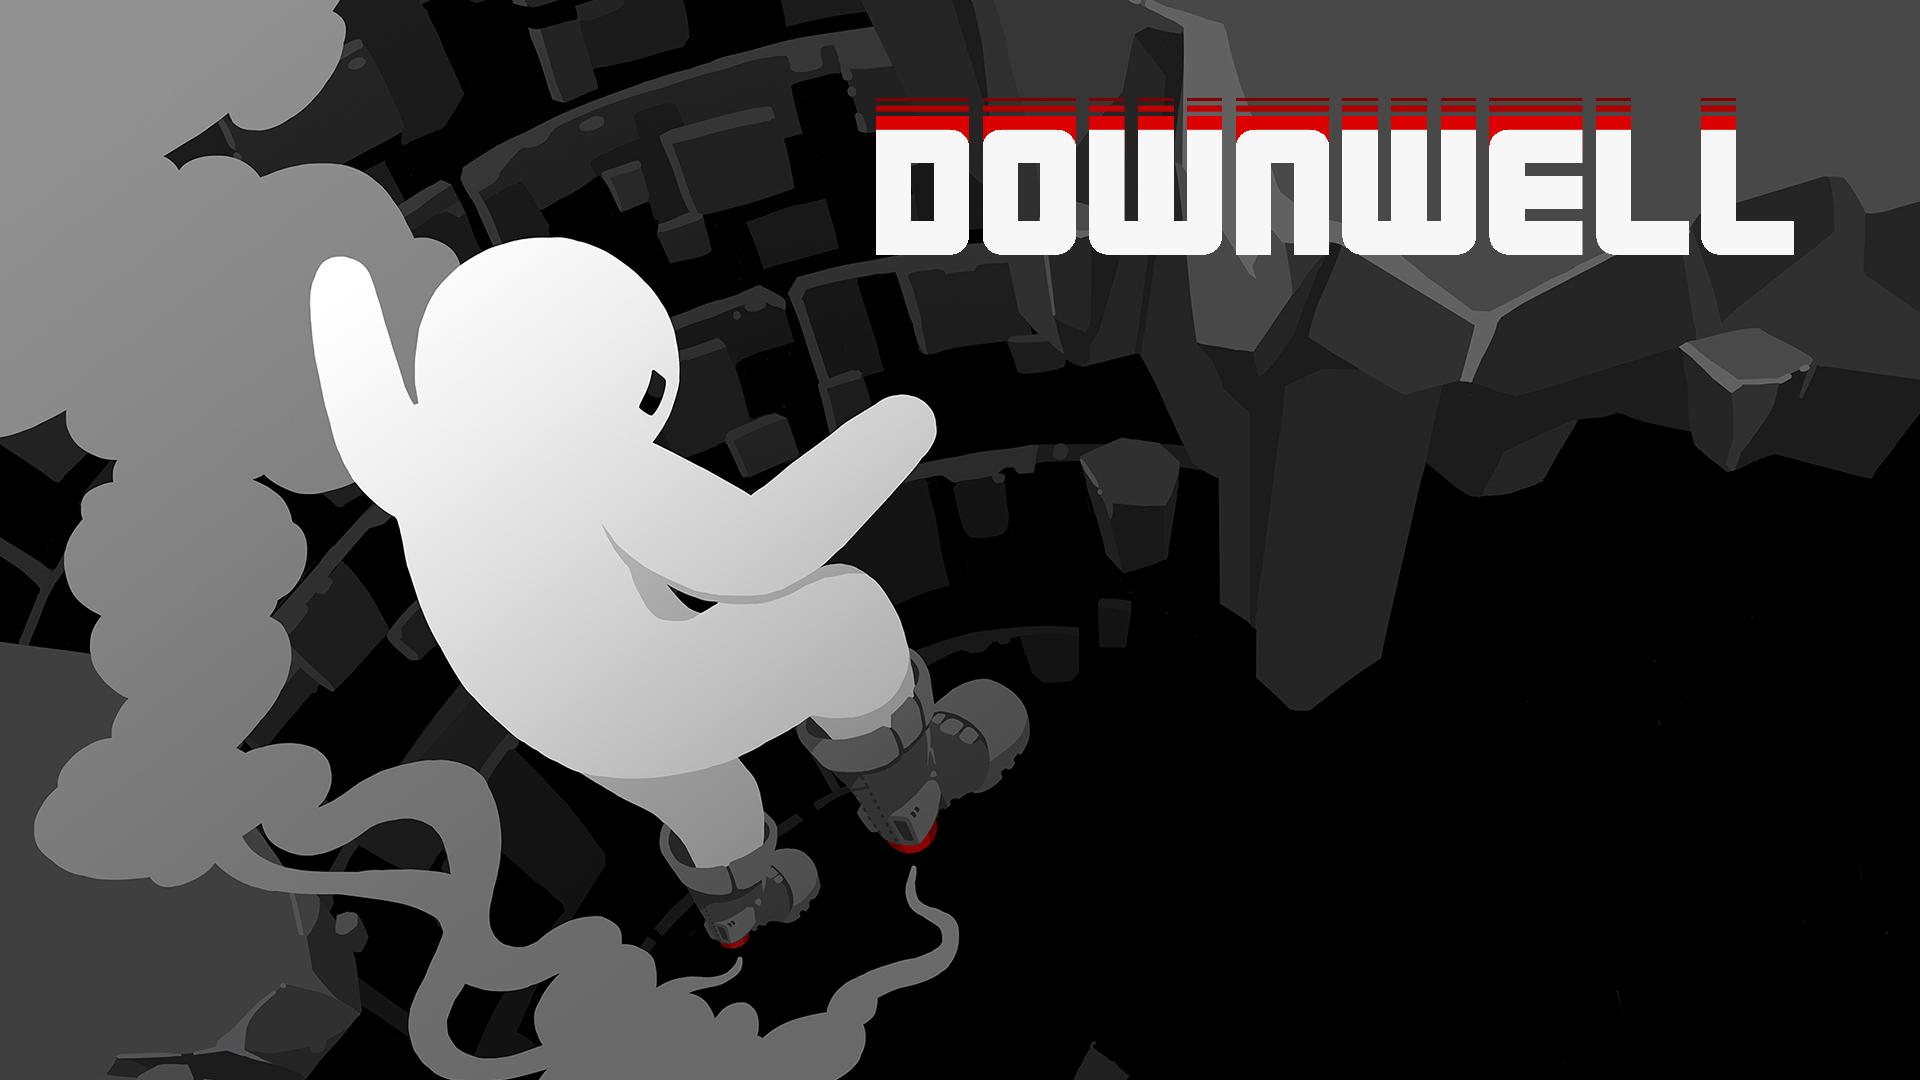 Nintendo Switch|ダウンロード購入|Downwell